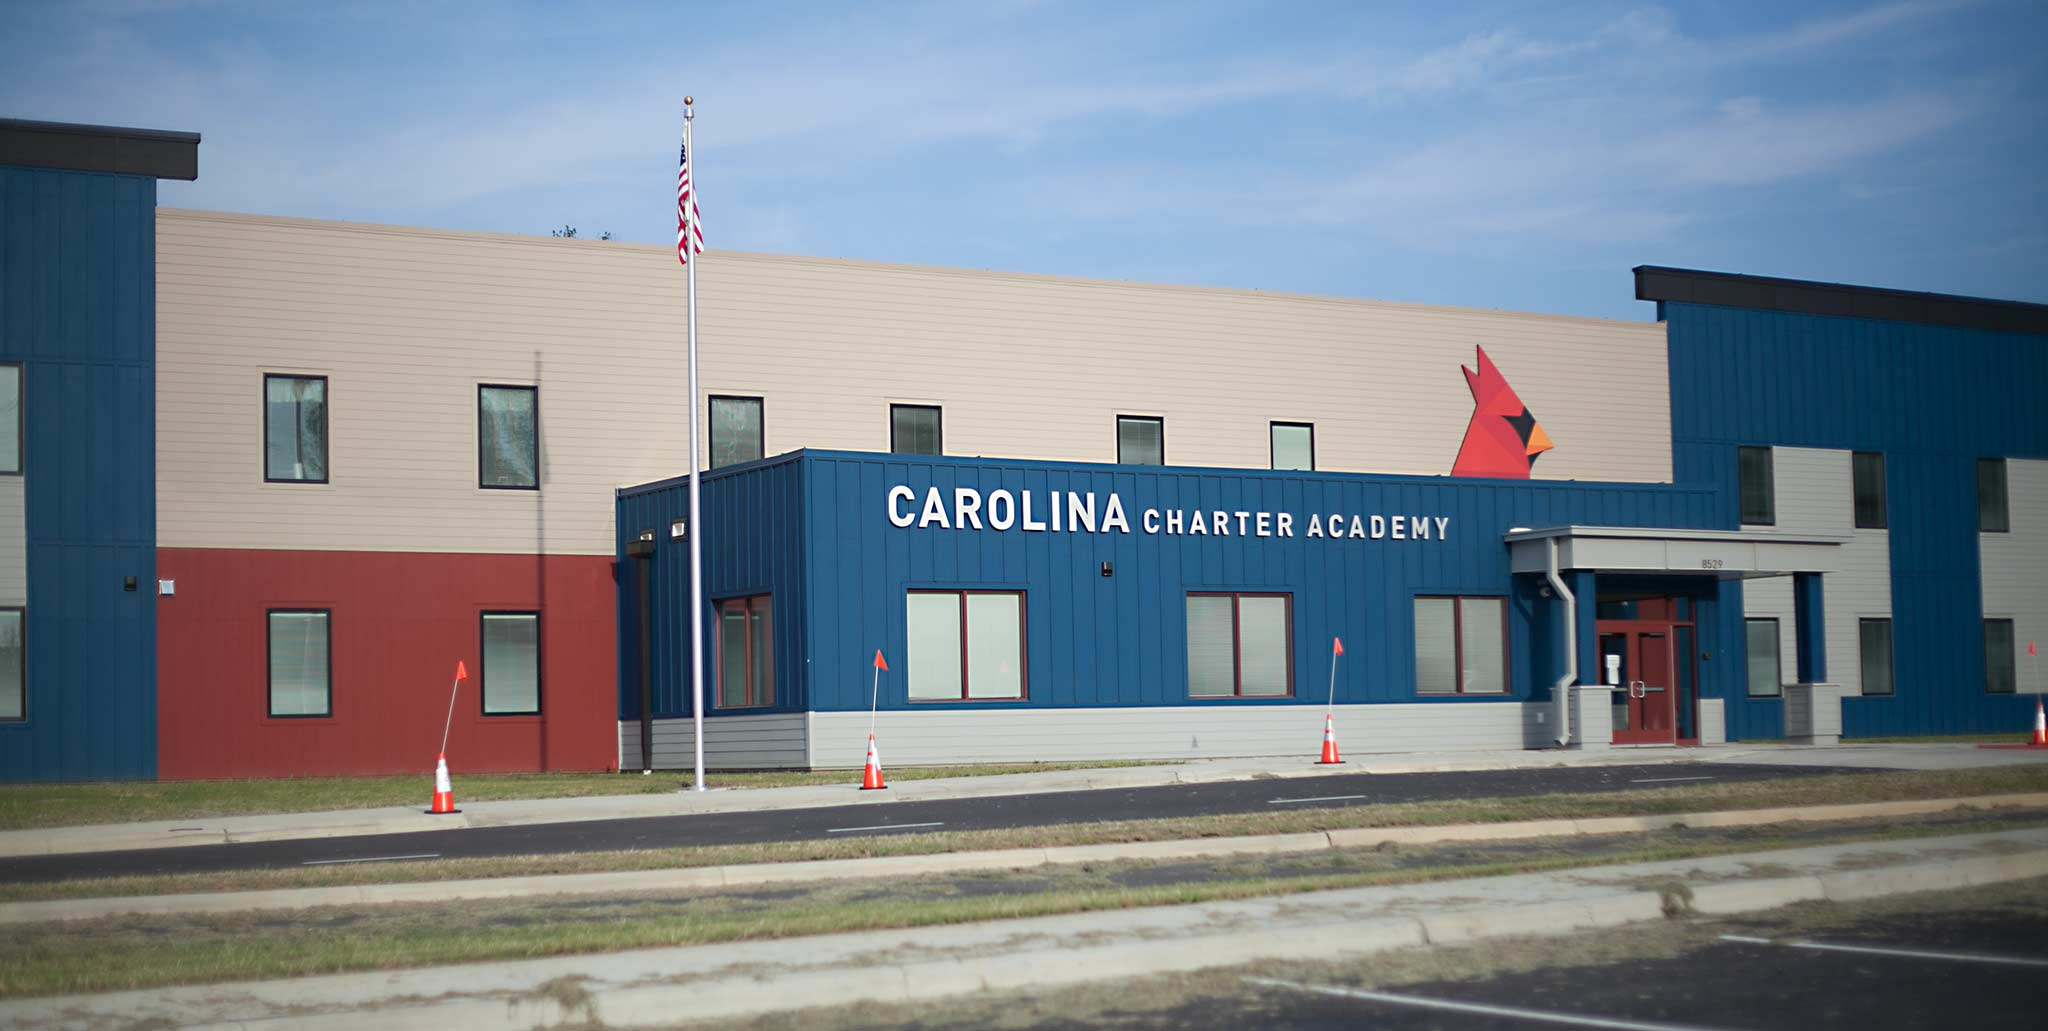 Carolina Charter Academy